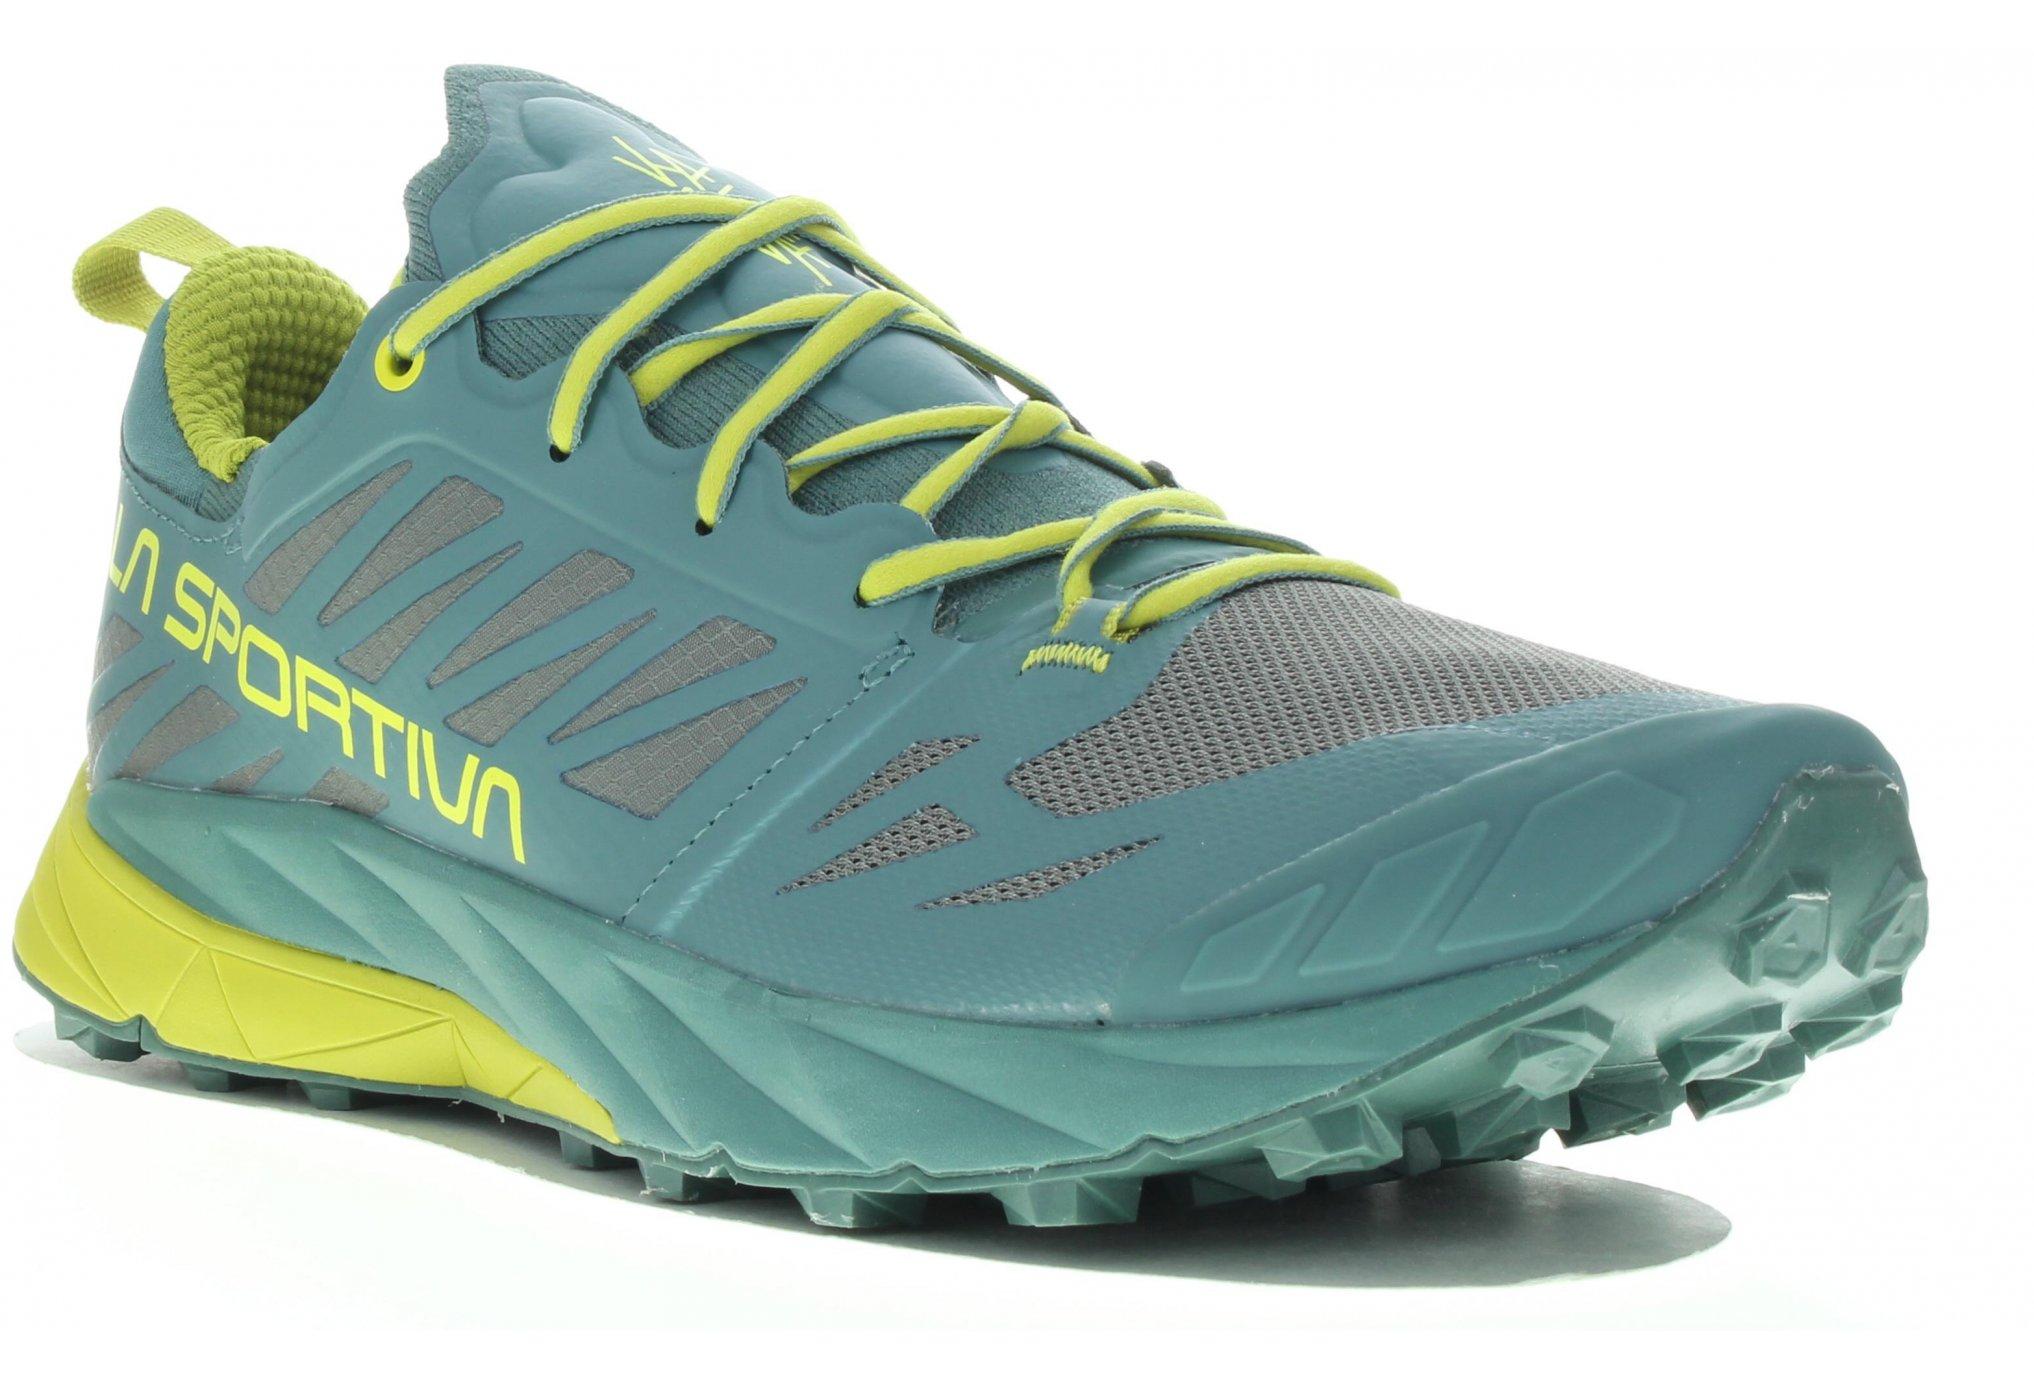 La Sportiva Kaptiva Chaussures homme